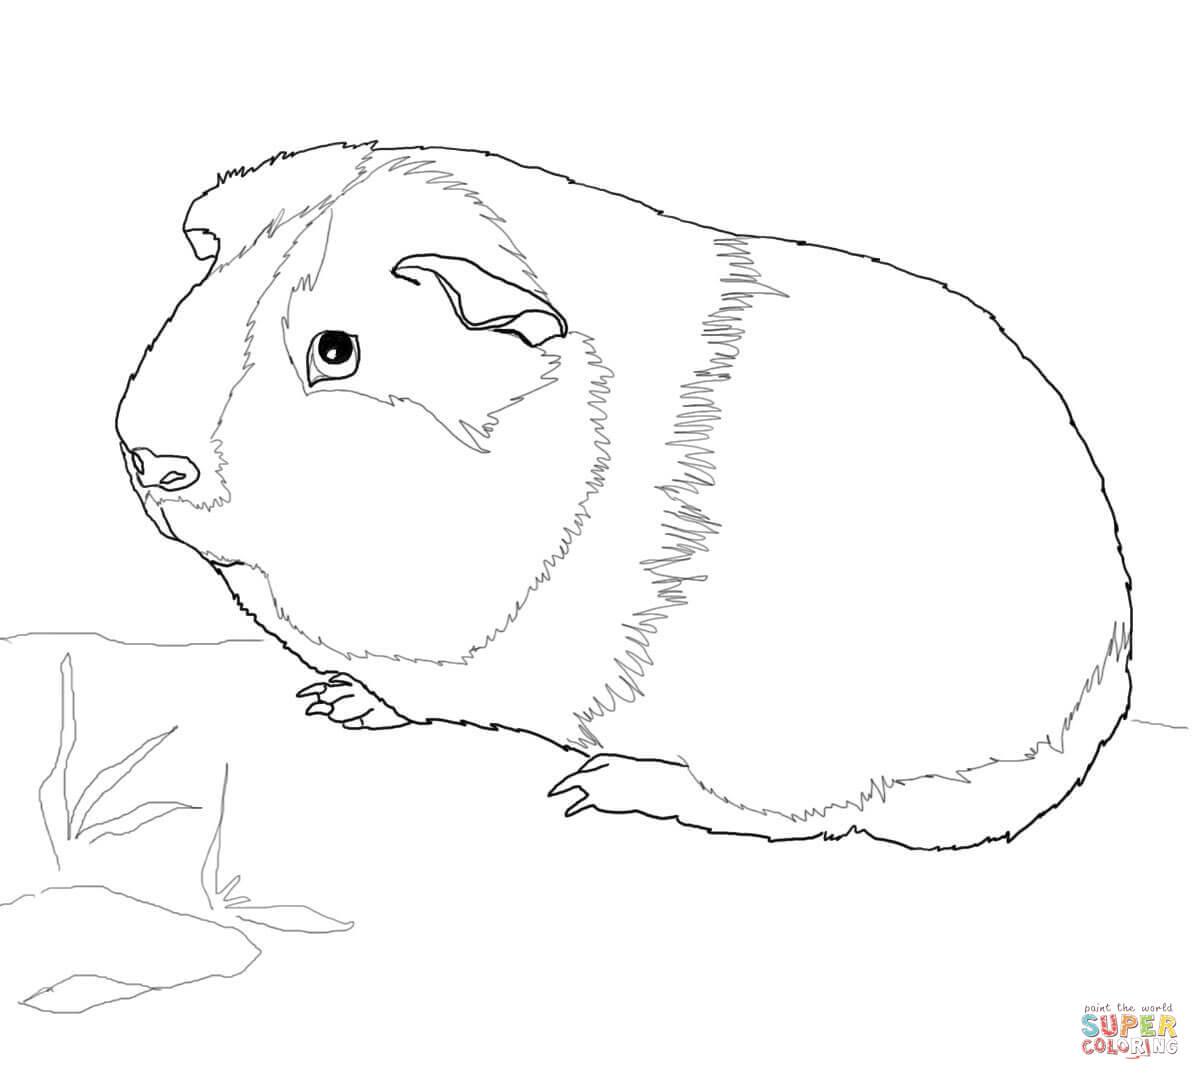 Ausmalbild: Süßes Meerschweinchen | Ausmalbilder Kostenlos über Meerschweinchen Bilder Zum Ausdrucken